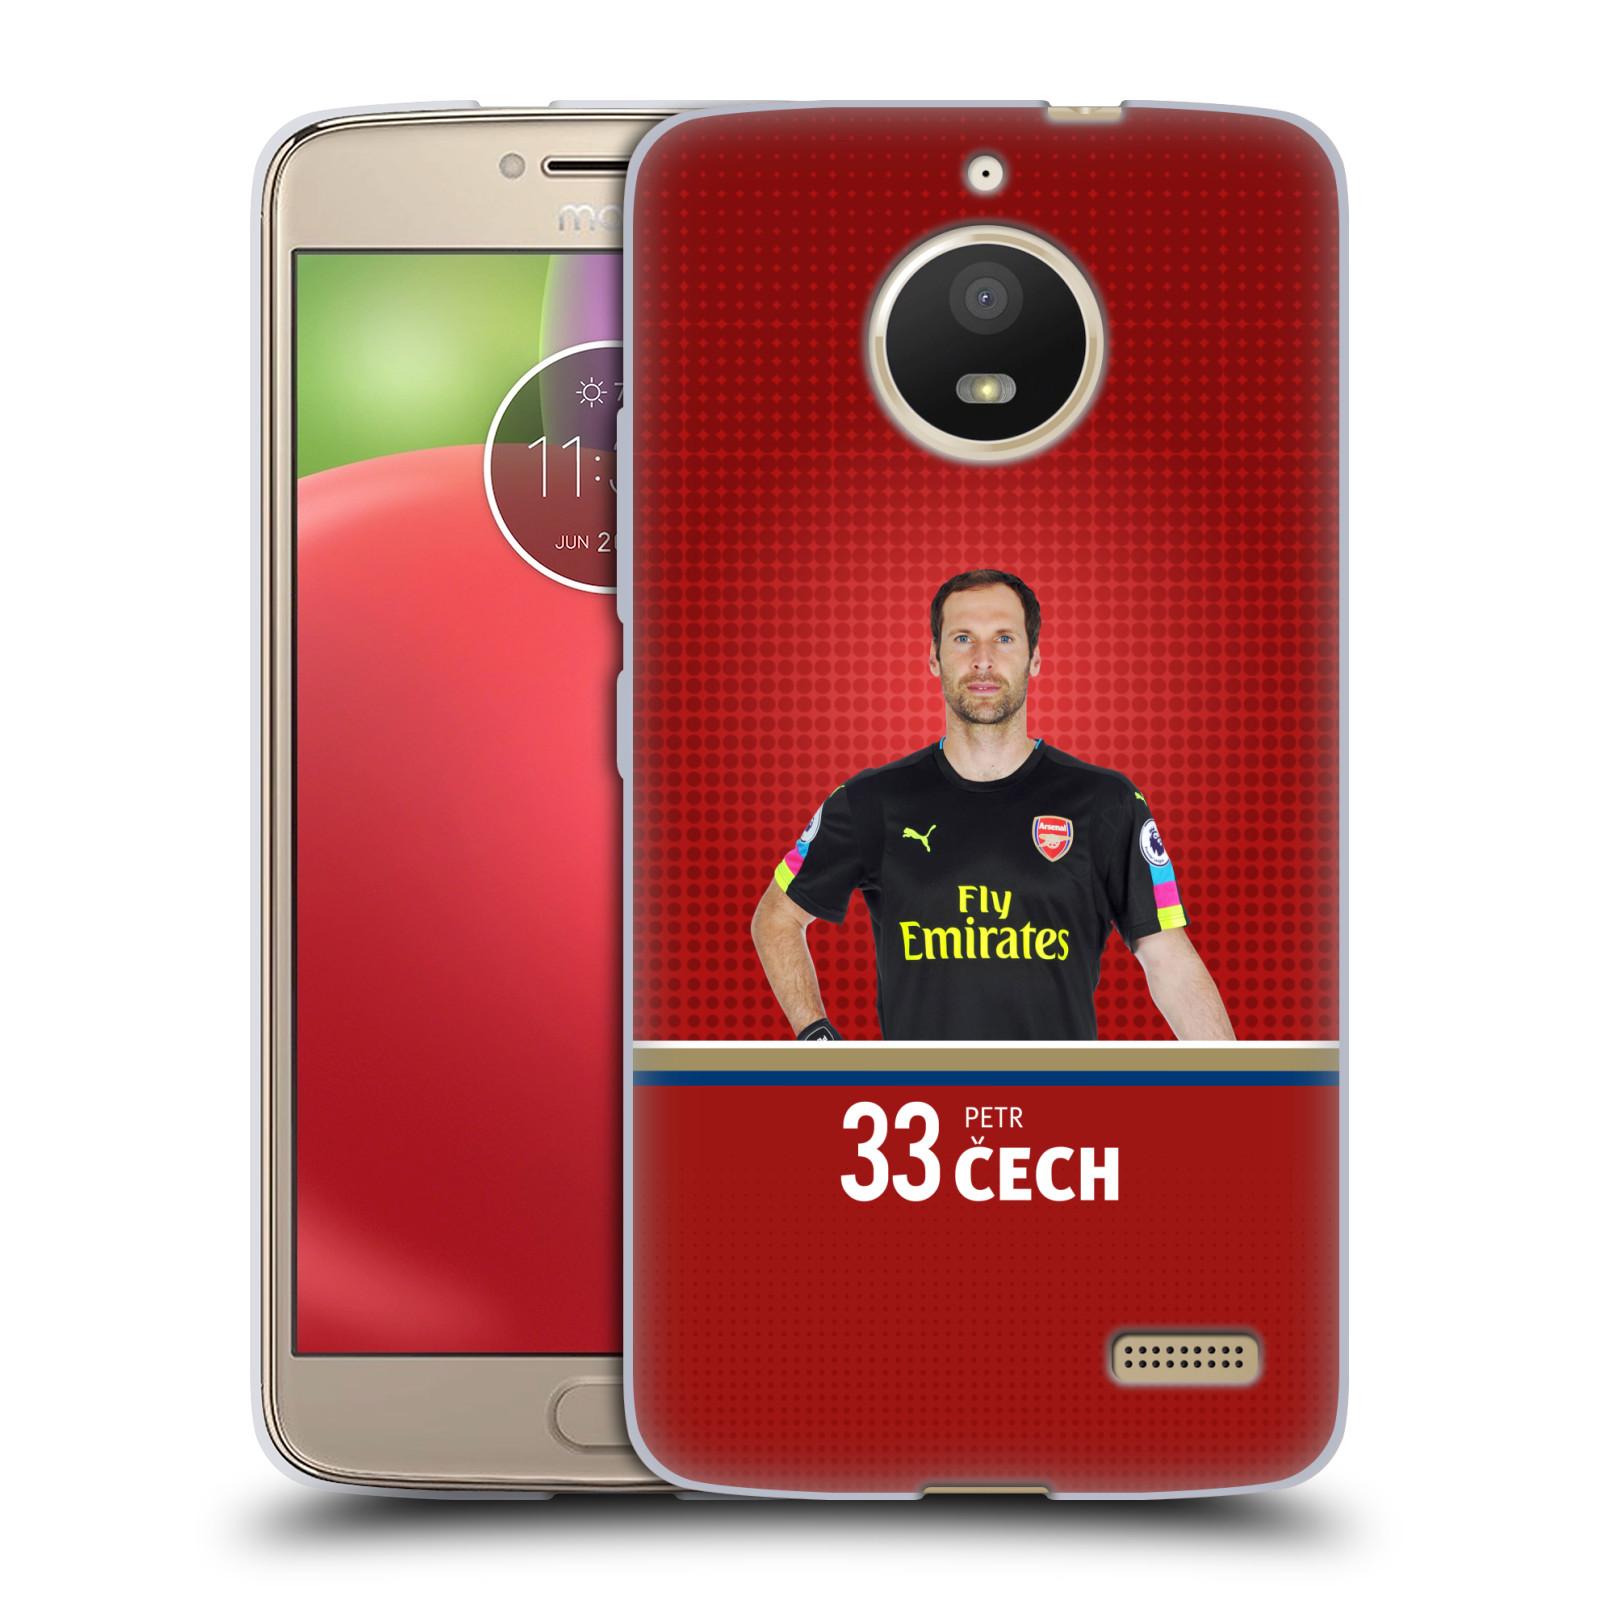 Silikonové pouzdro na mobil Lenovo Moto E4 - Head Case - Arsenal FC - Petr Čech